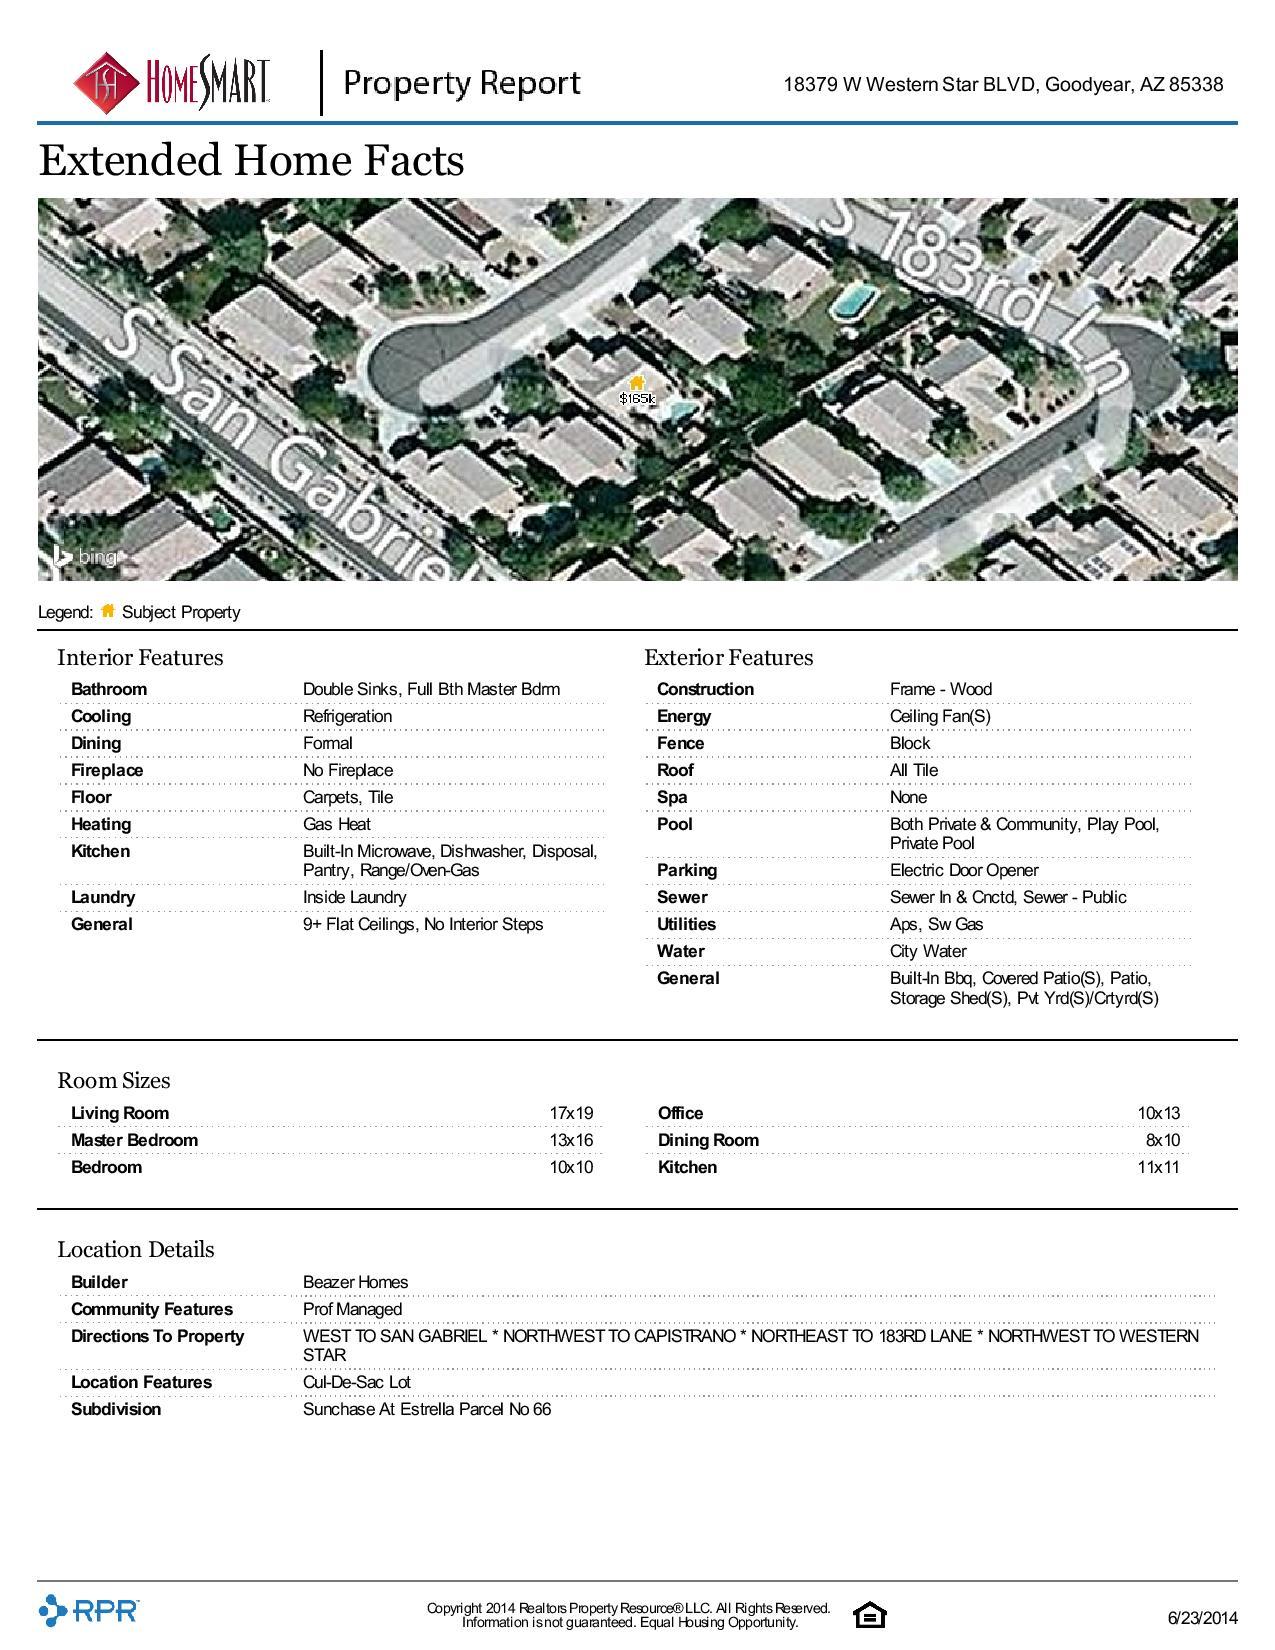 18379-W-Western-Star-BLVD-Goodyear-AZ-85338-page-004